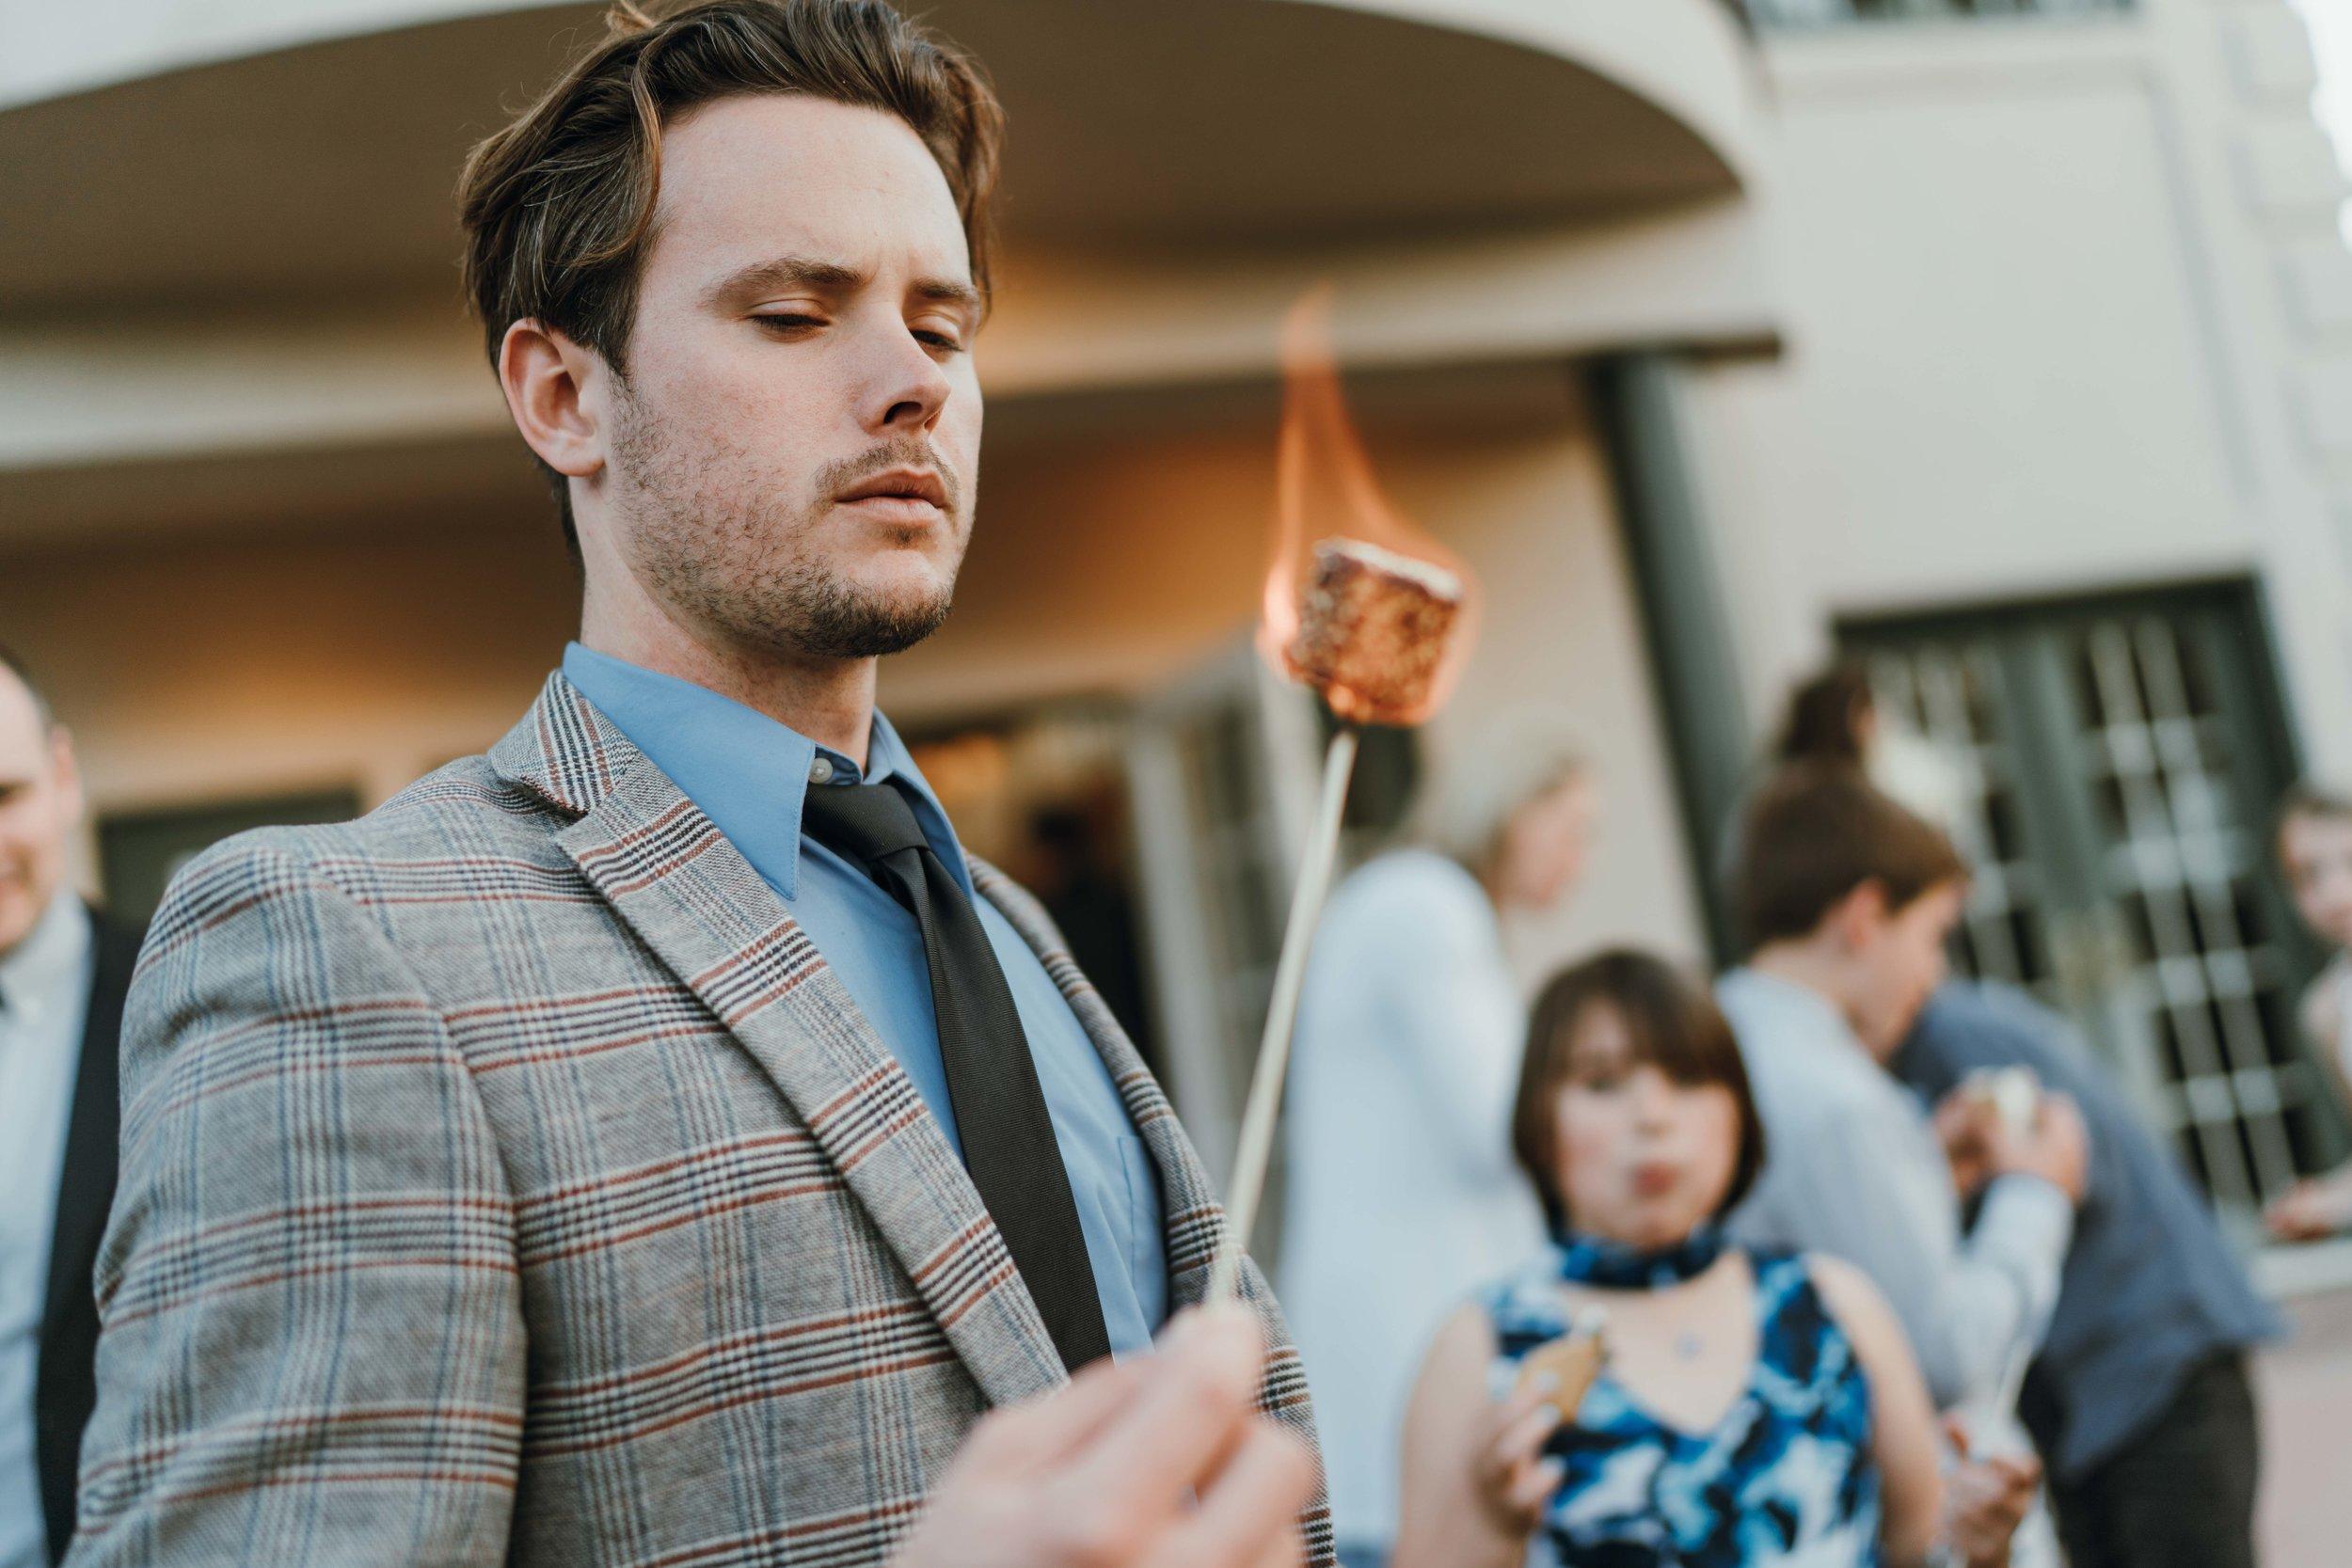 denver wedding photographer lioncrest manor in lyons ben and mali -DSC06883.jpg